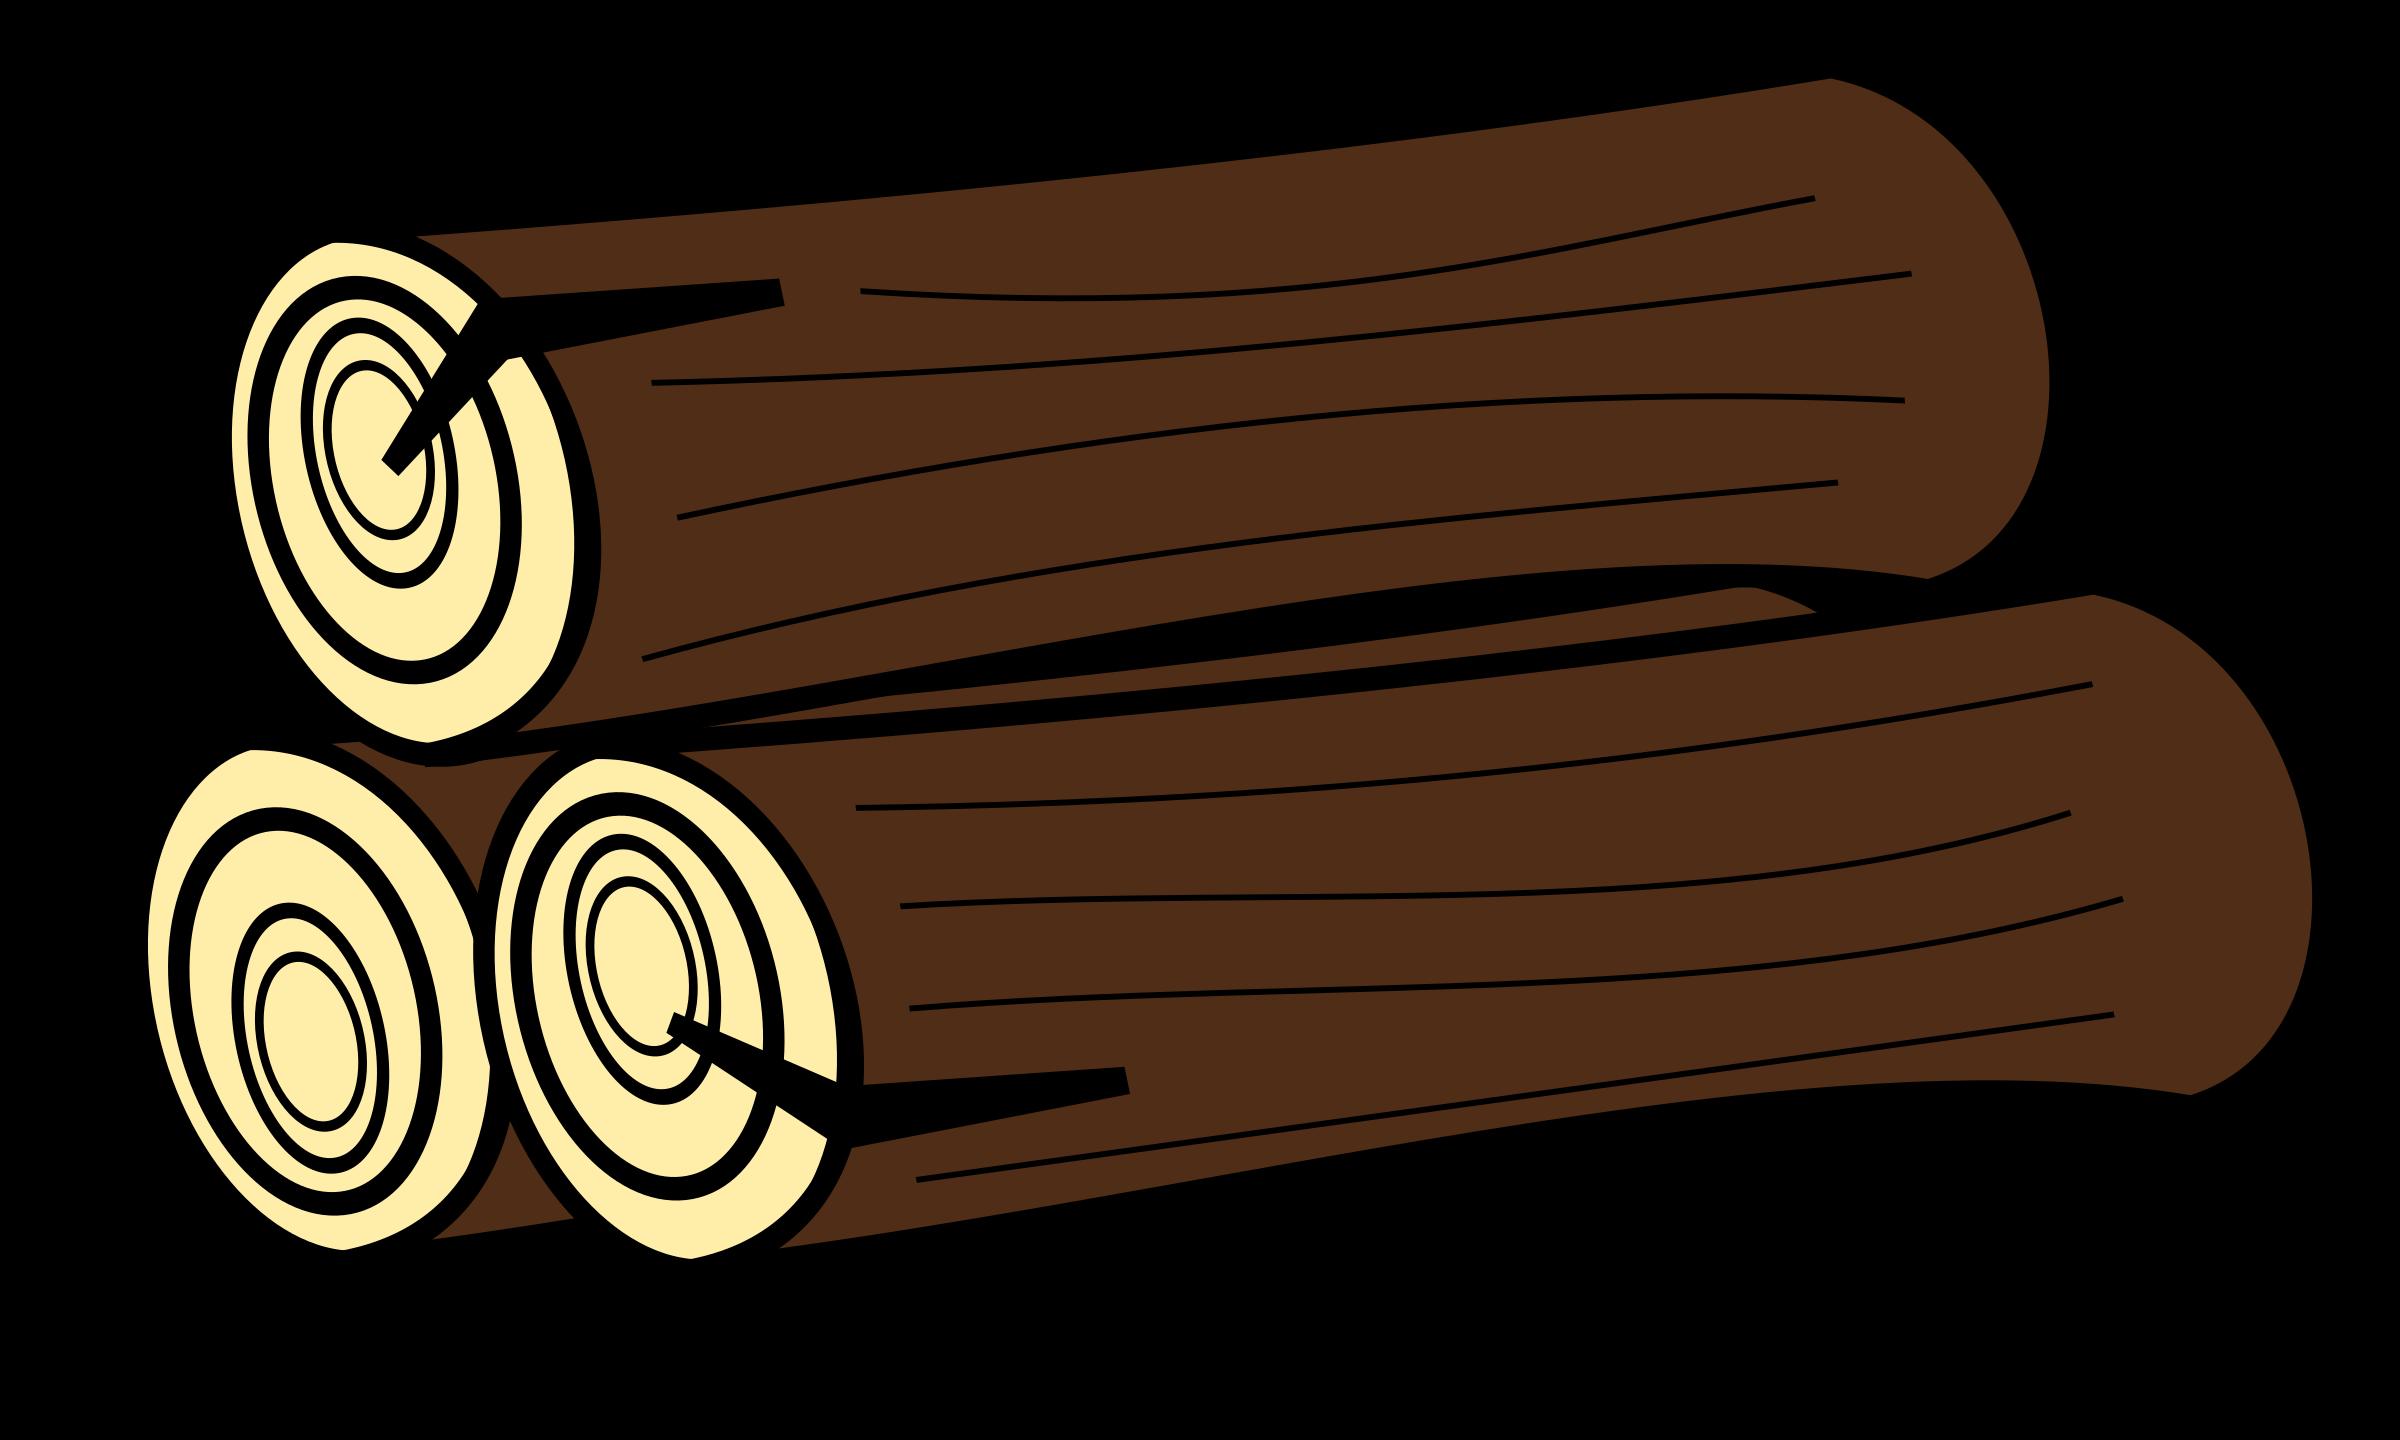 Firewood clipart campfire wood, Firewood campfire wood.